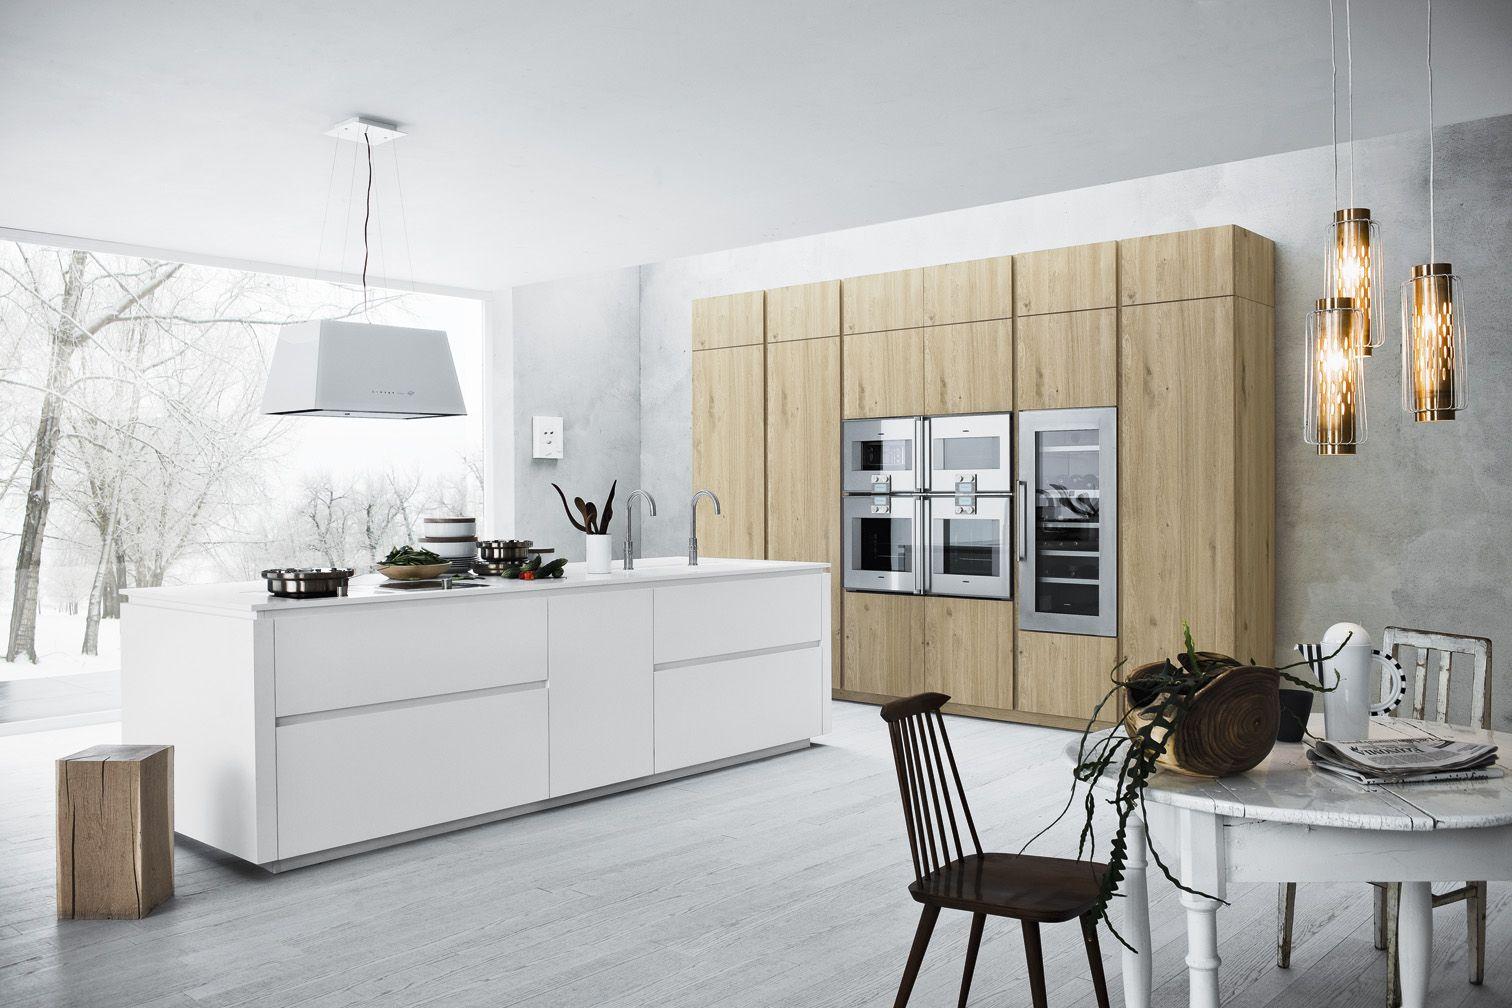 Küchenideen stein cesar keuken model cloe italiaans design  cesar keukens